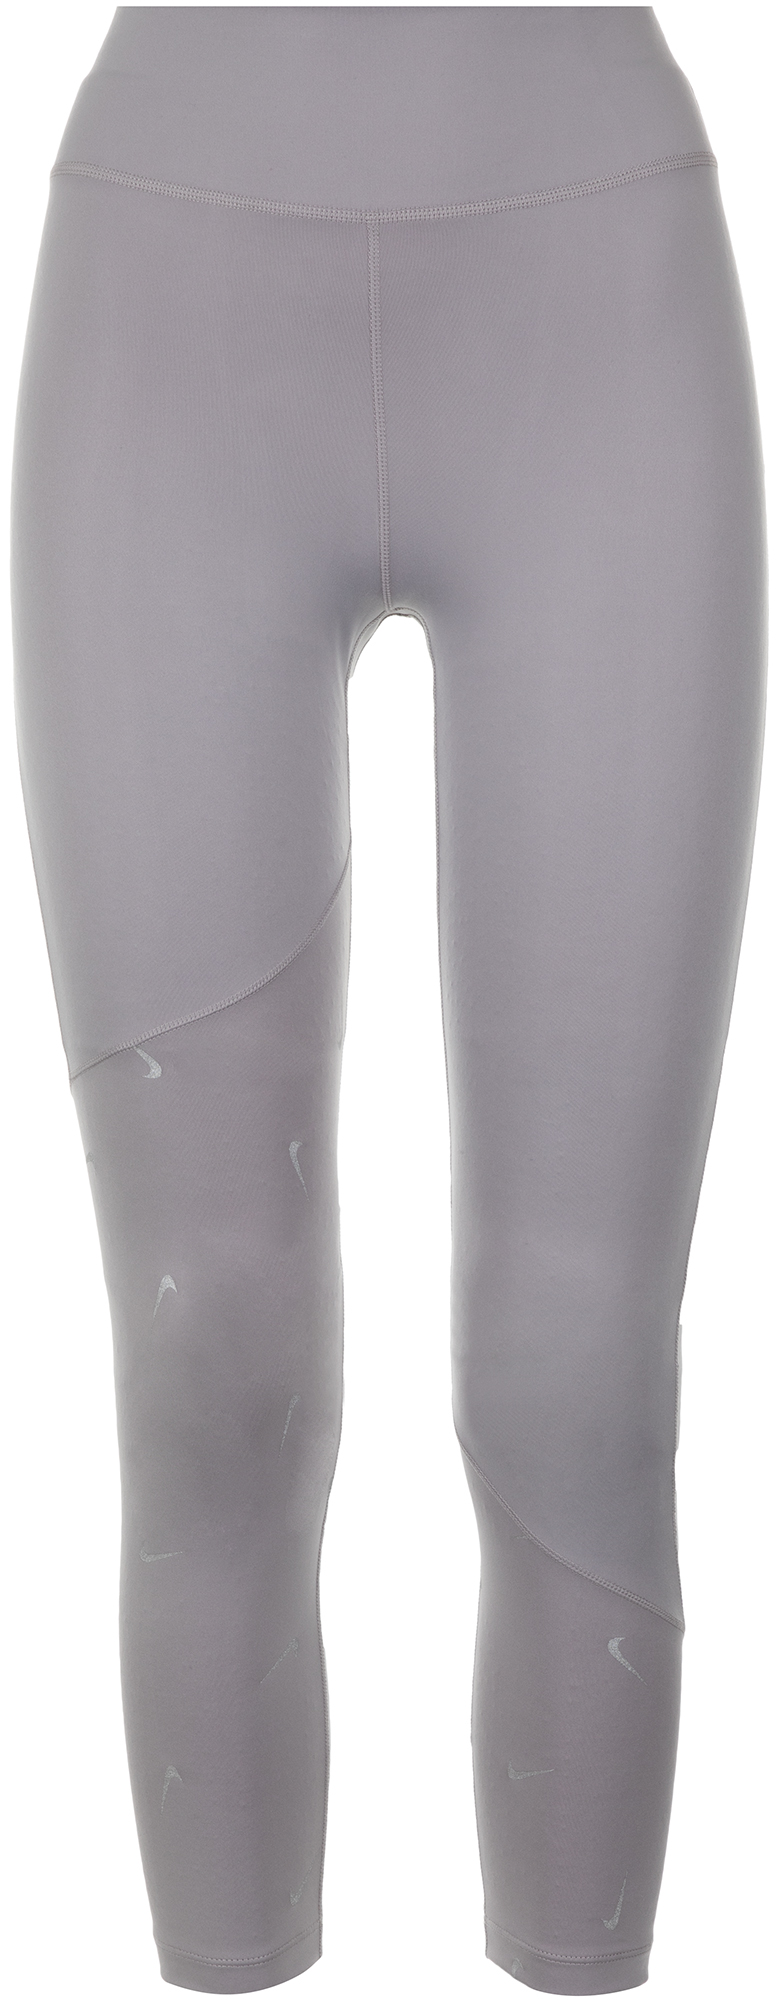 Nike Бриджи женские Nike All-In, размер 46-48 nike бриджи женские nike sportswear vintage размер 48 50